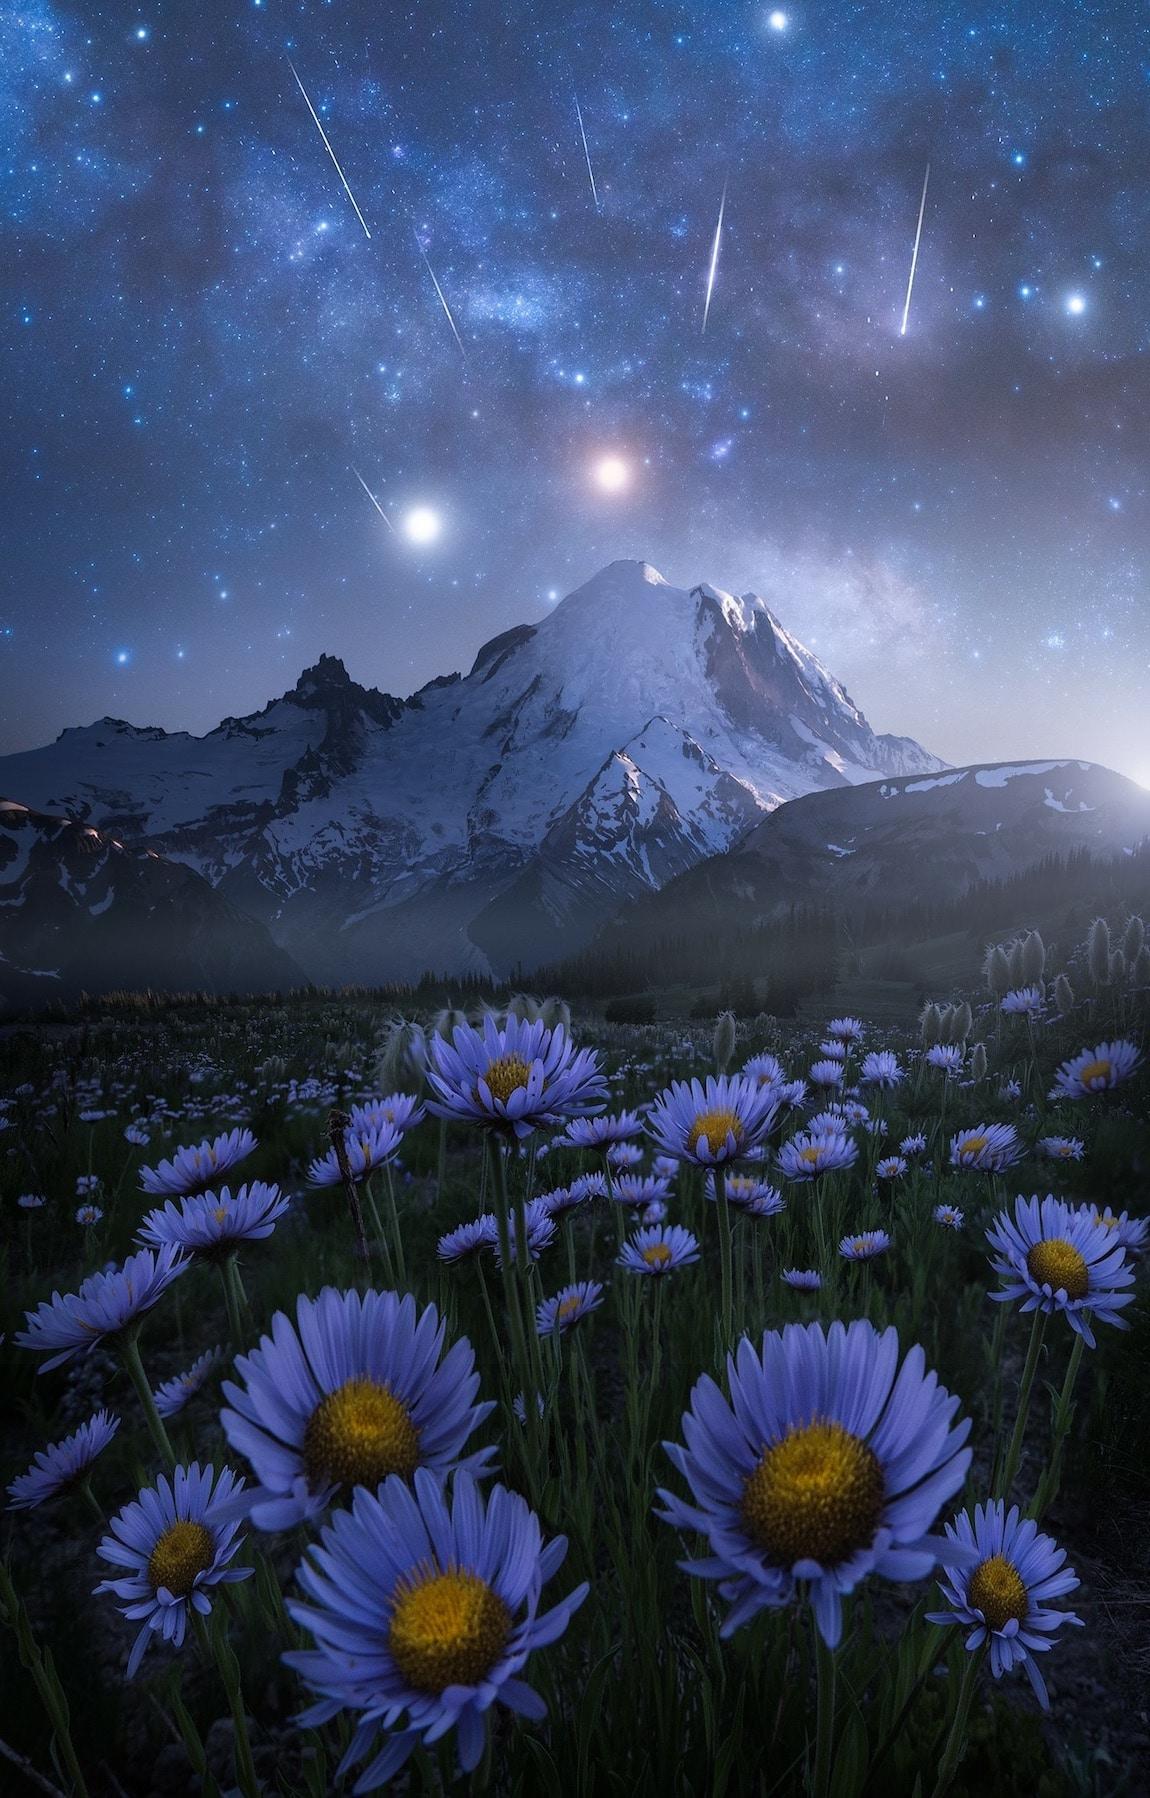 night-landscape-photography-5